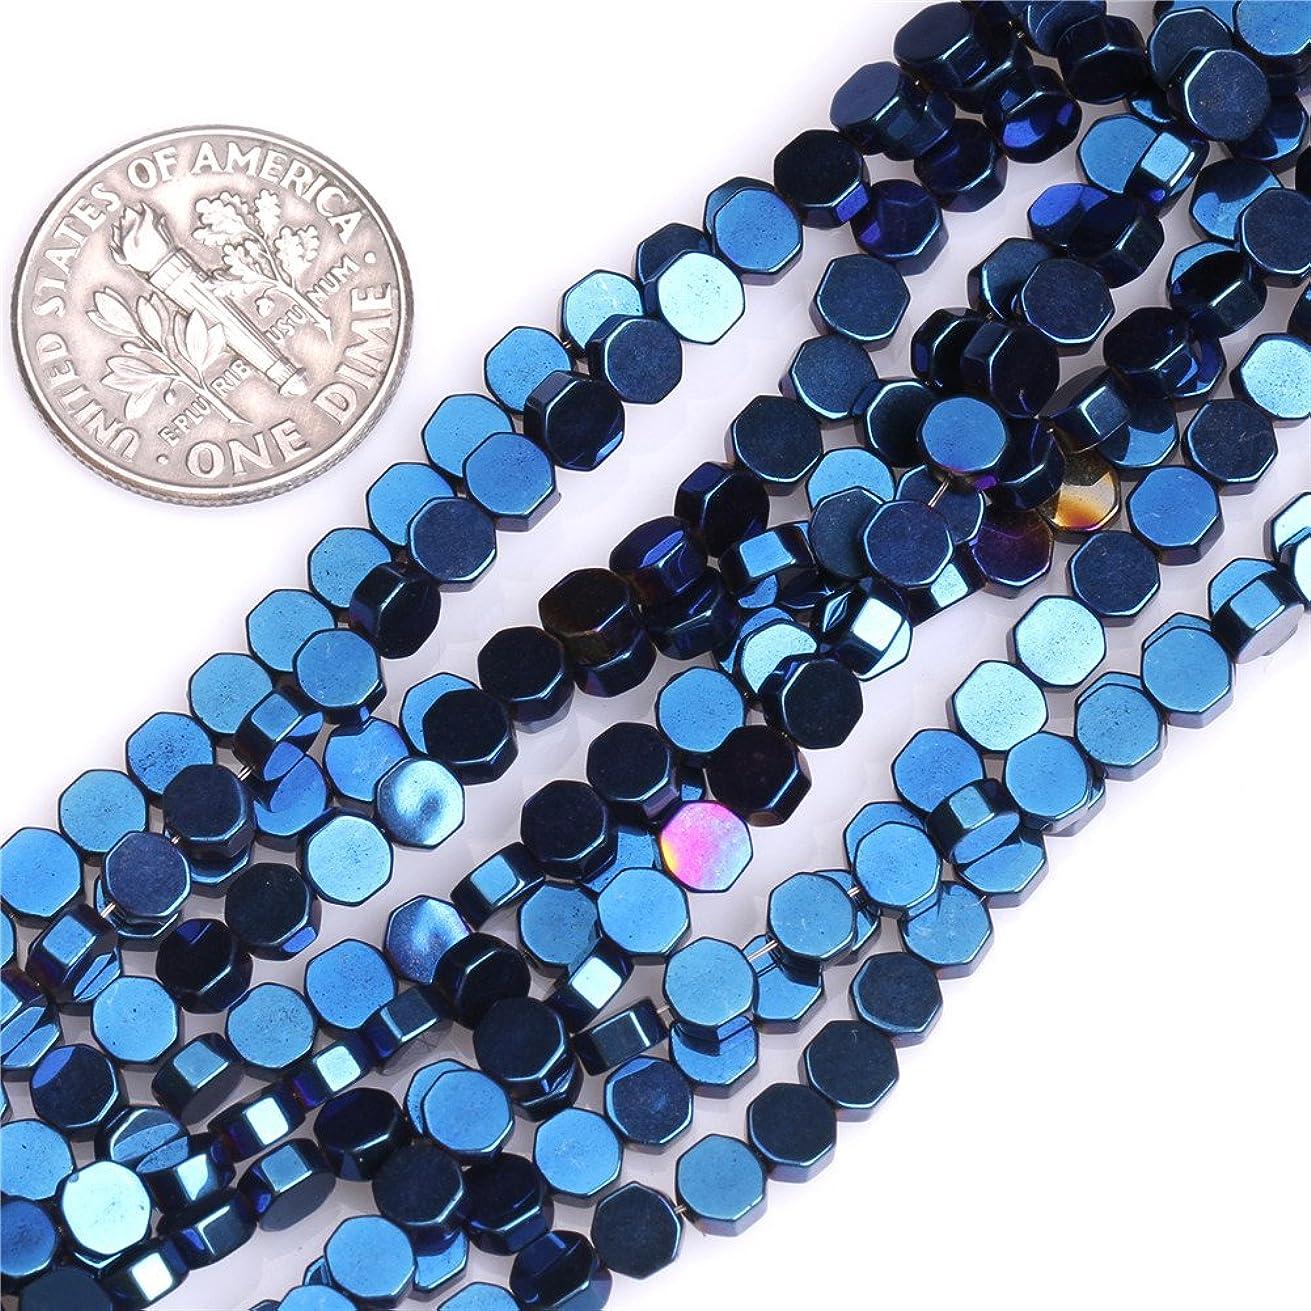 JOE FOREMAN 4mm Hematite Semi Precious Gemstone Blue Hexagon Loose Beads for Jewelry Making DIY Handmade Craft Supplies 15